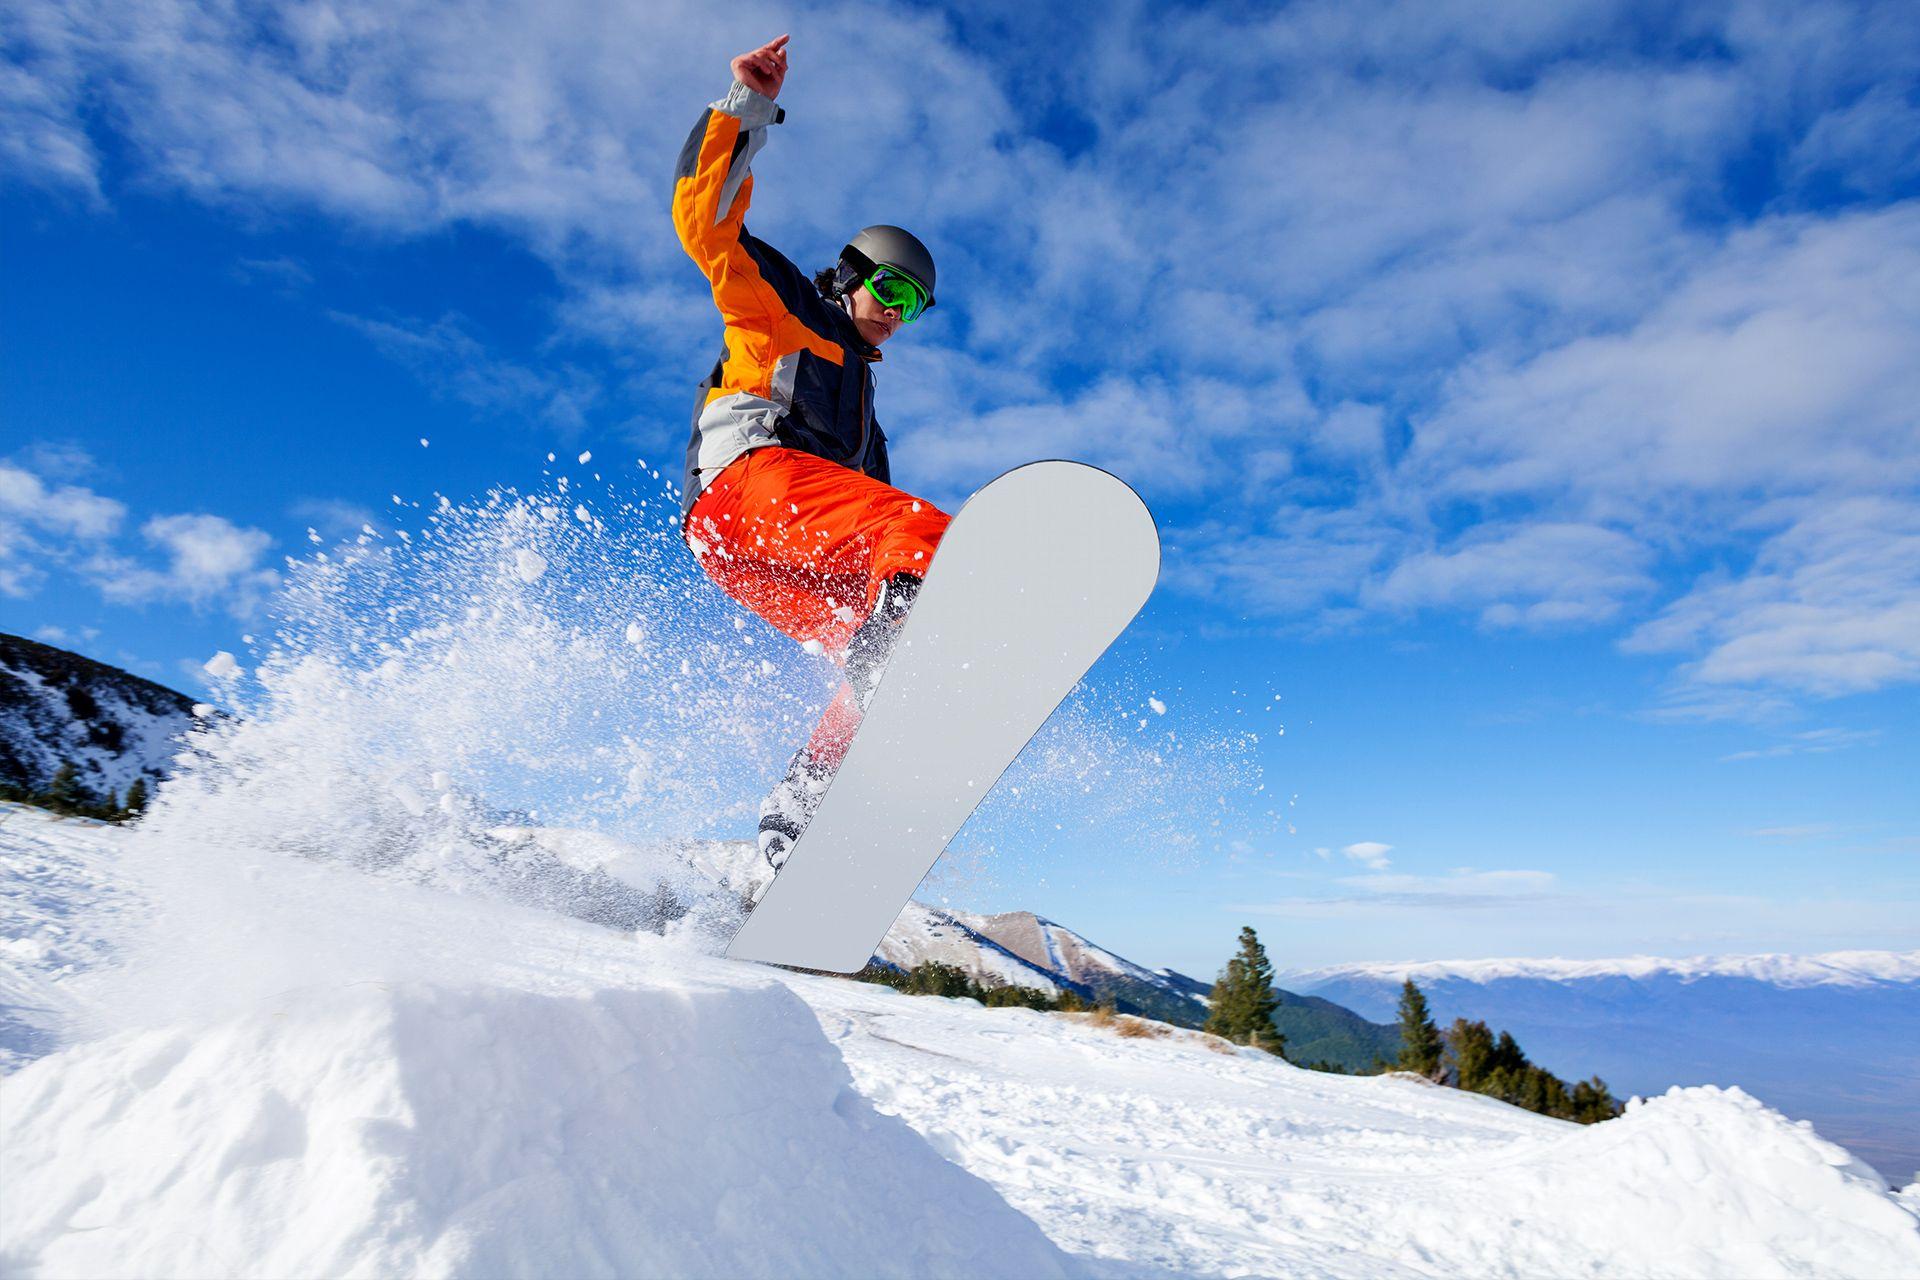 snowboardkurs in bad t lz ab 45 als geschenkidee. Black Bedroom Furniture Sets. Home Design Ideas